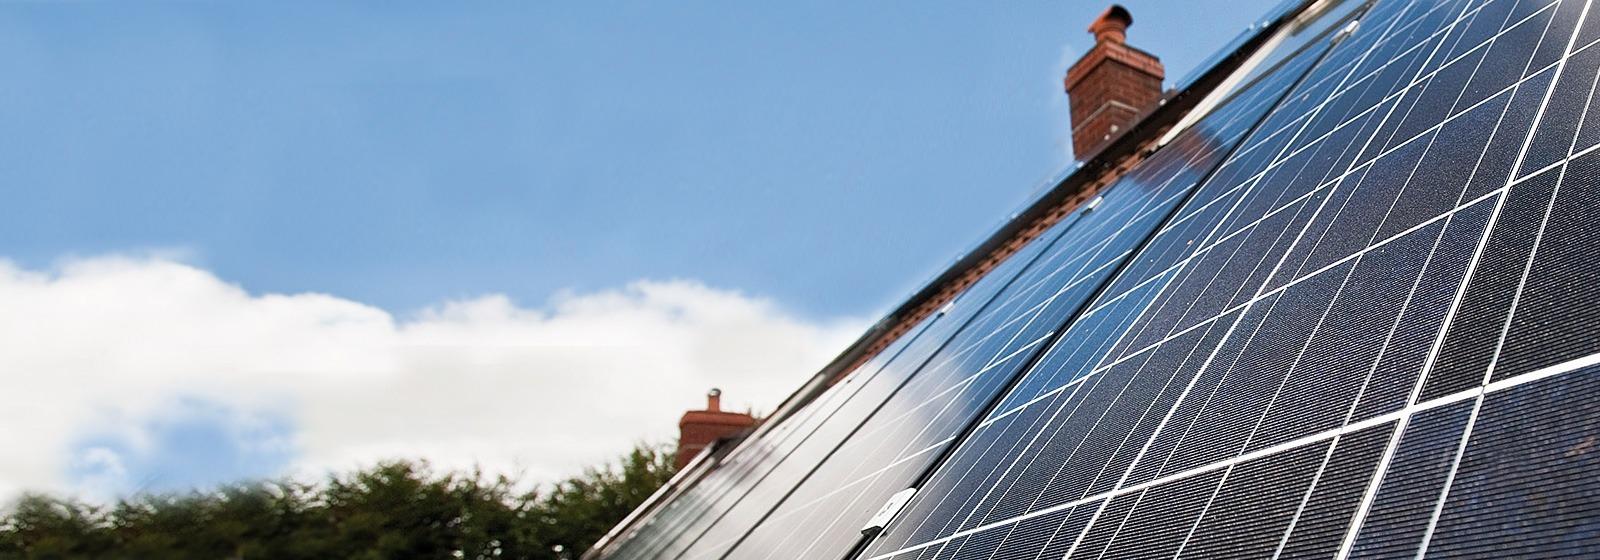 hight resolution of solar photovaltaics pv